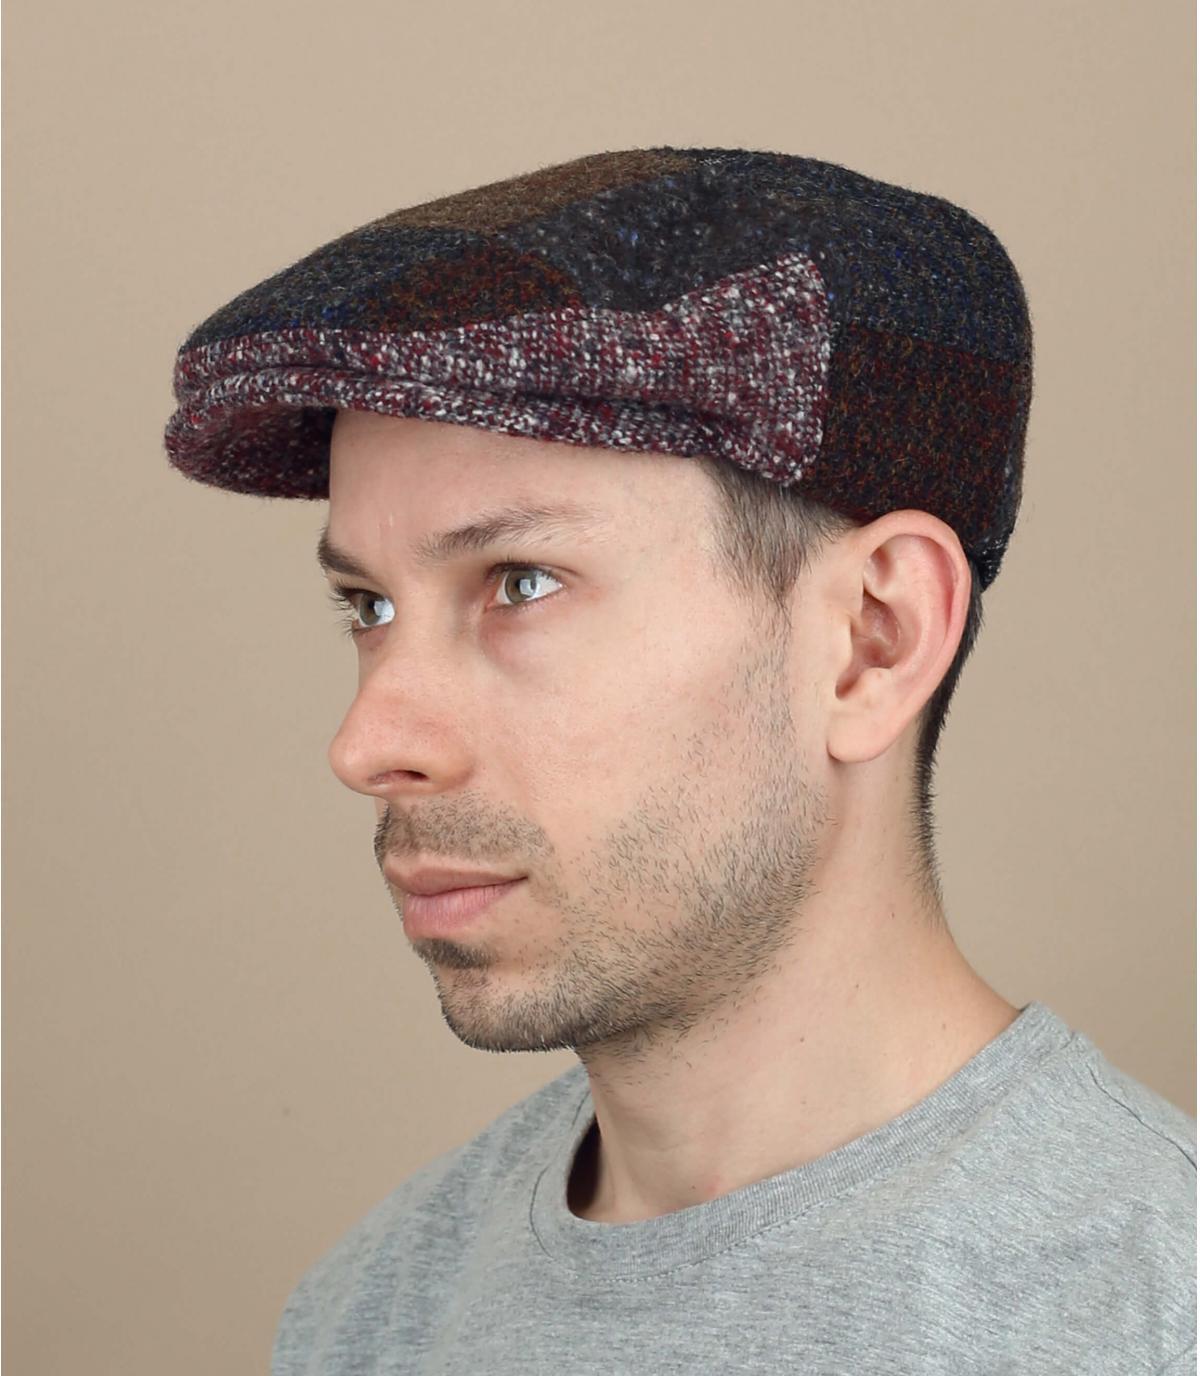 wollen lappendeken baret